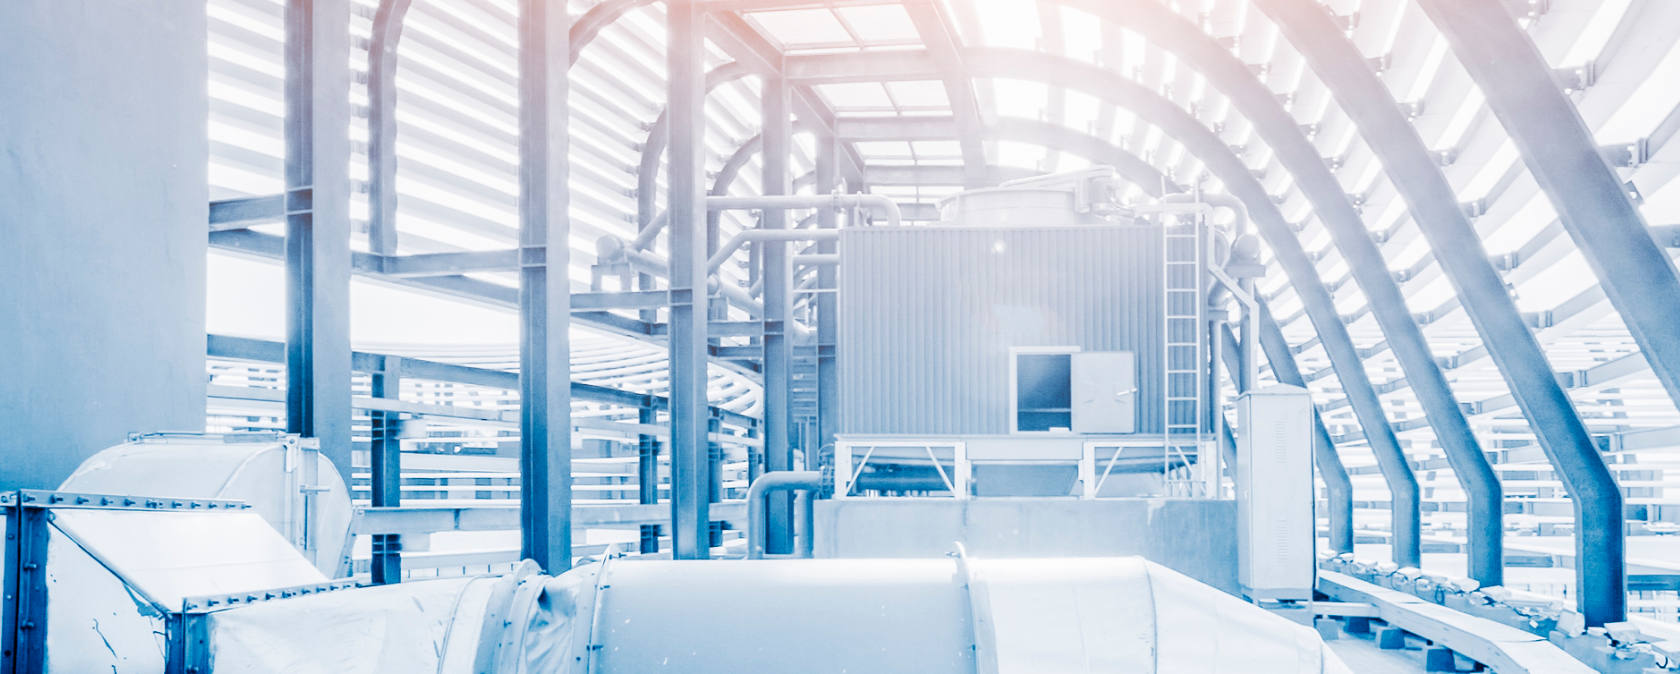 Industrial filtering equipment